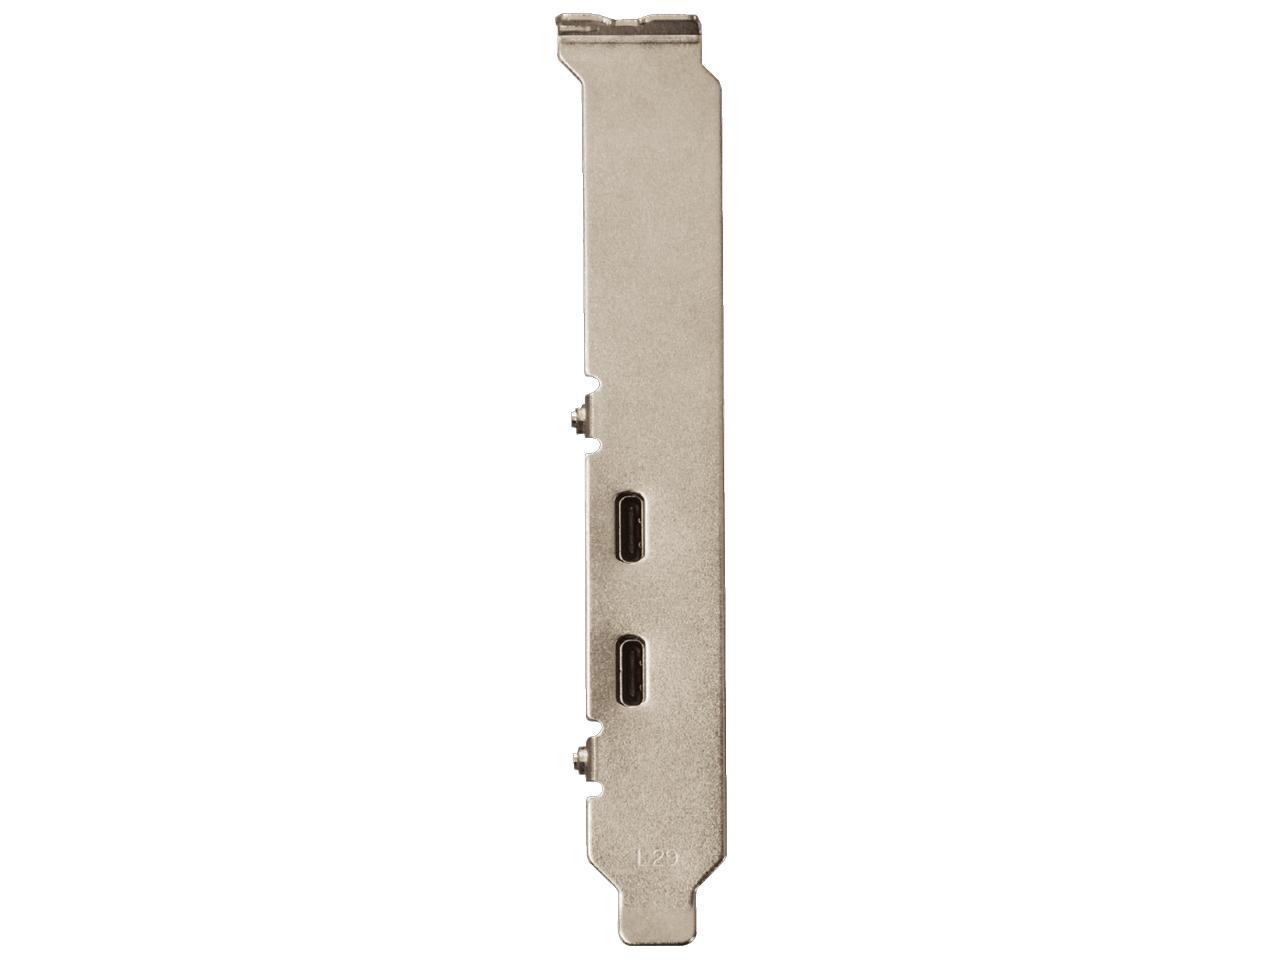 『本体 接続部分2』 USB3.1C-P2-PCIE [USB3.1] の製品画像